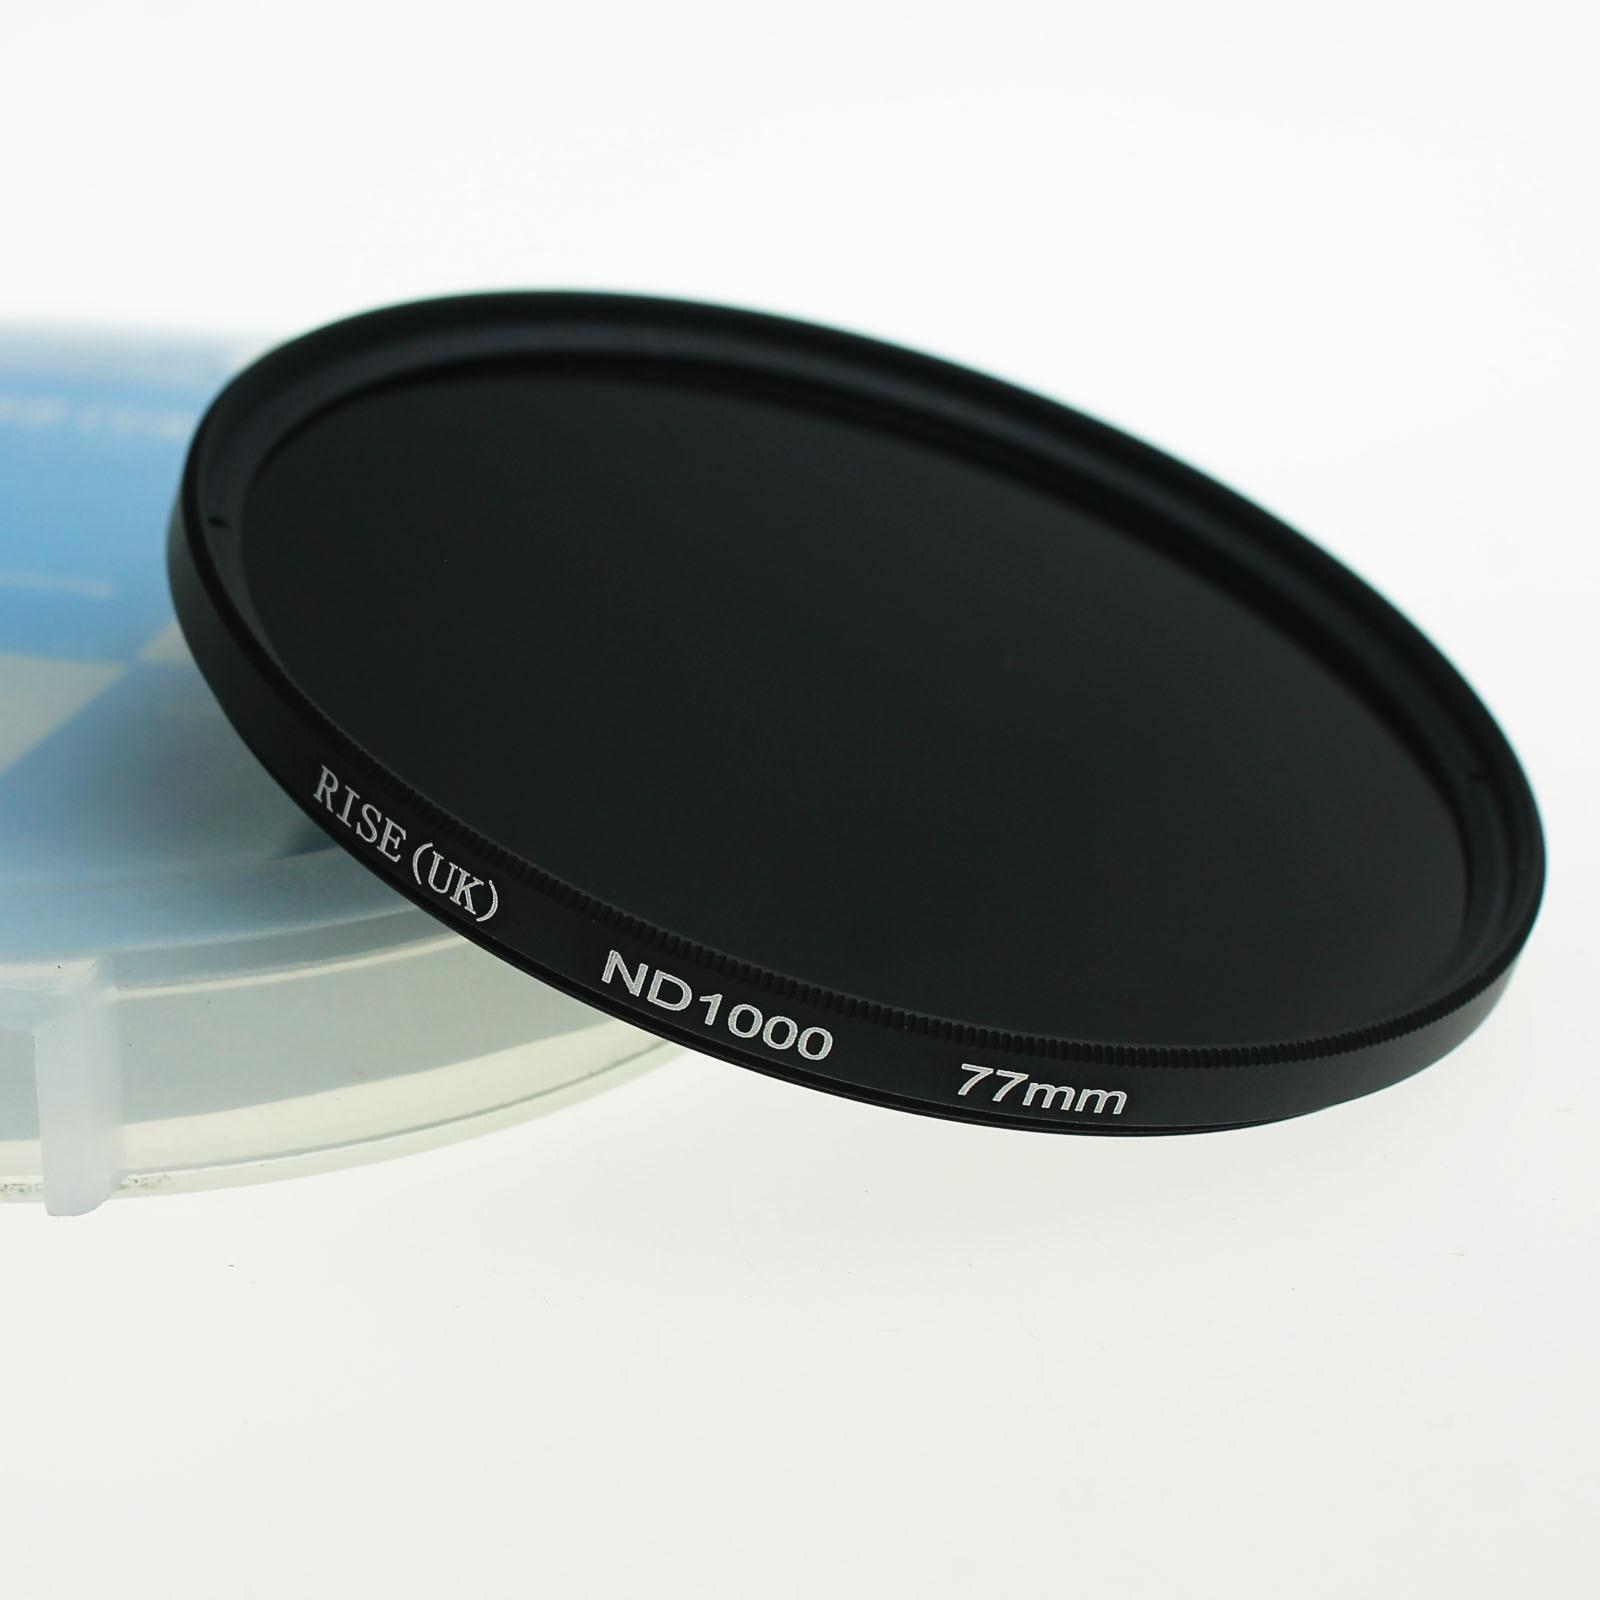 RISE 77mm slim Neutral density optical grade ND ND1000 filter for digital camera lens DV